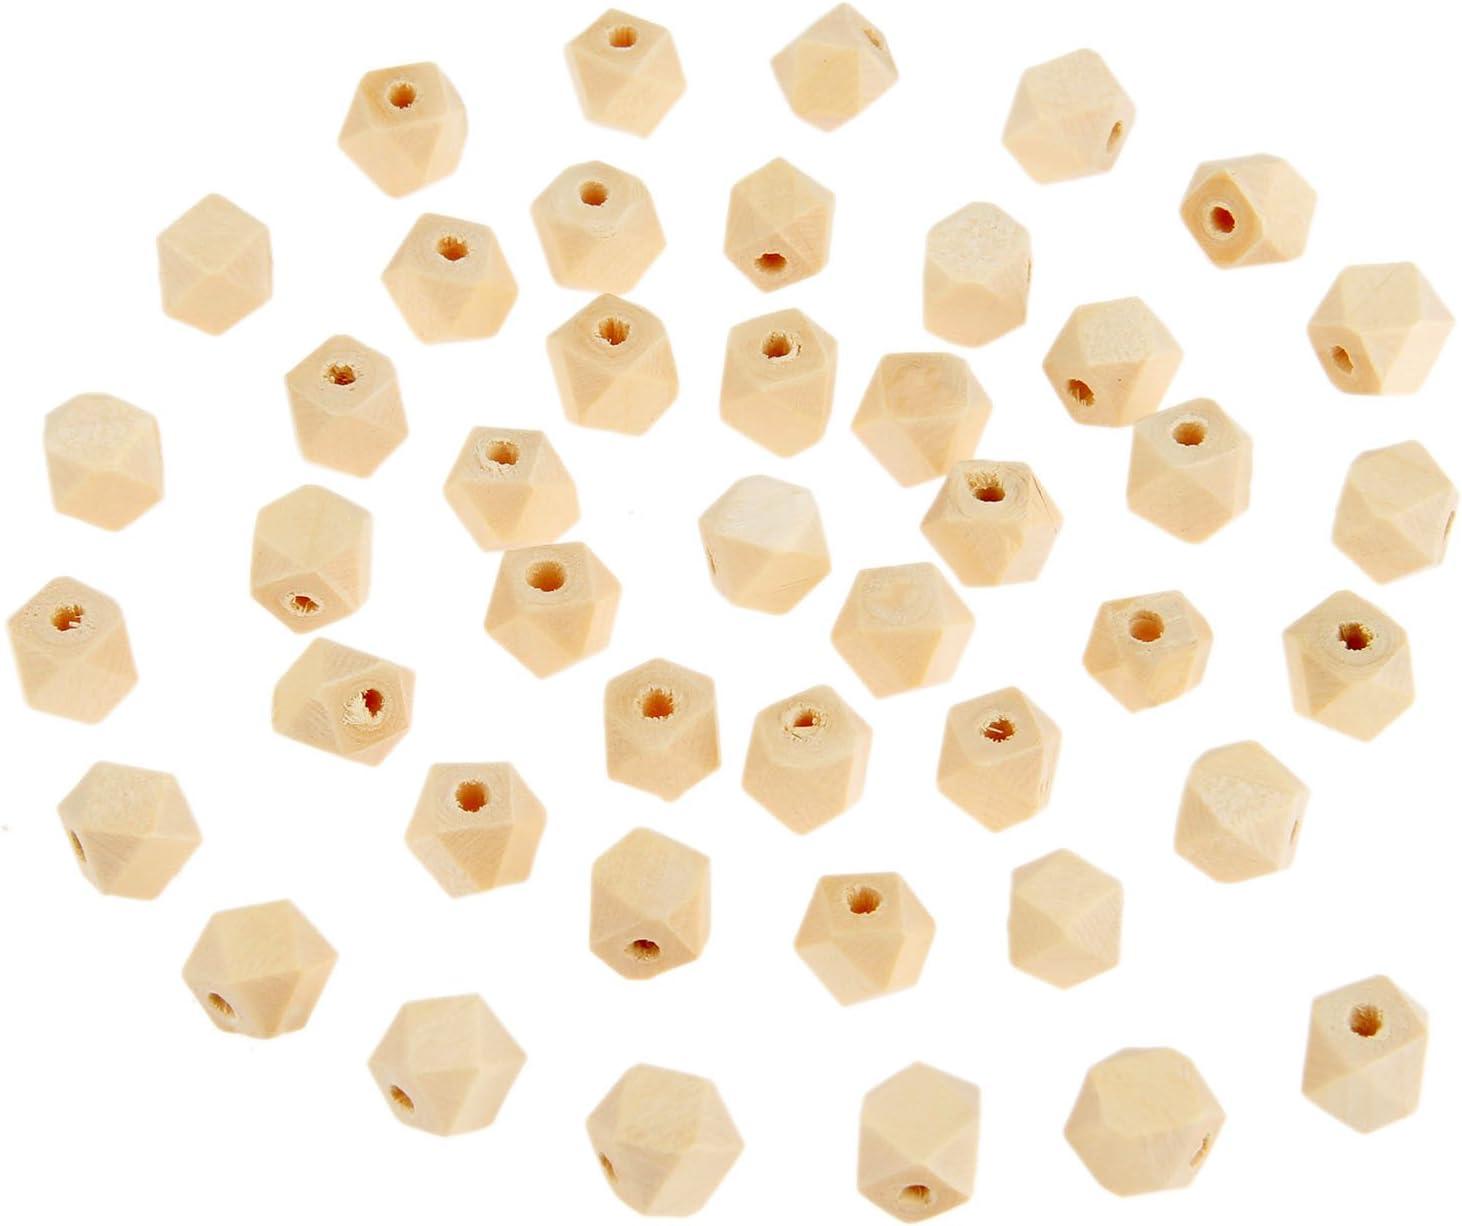 100 Stück Glaswachsperlen 8 mm schwarz  Perlen basteln Schmuck Perlen V328